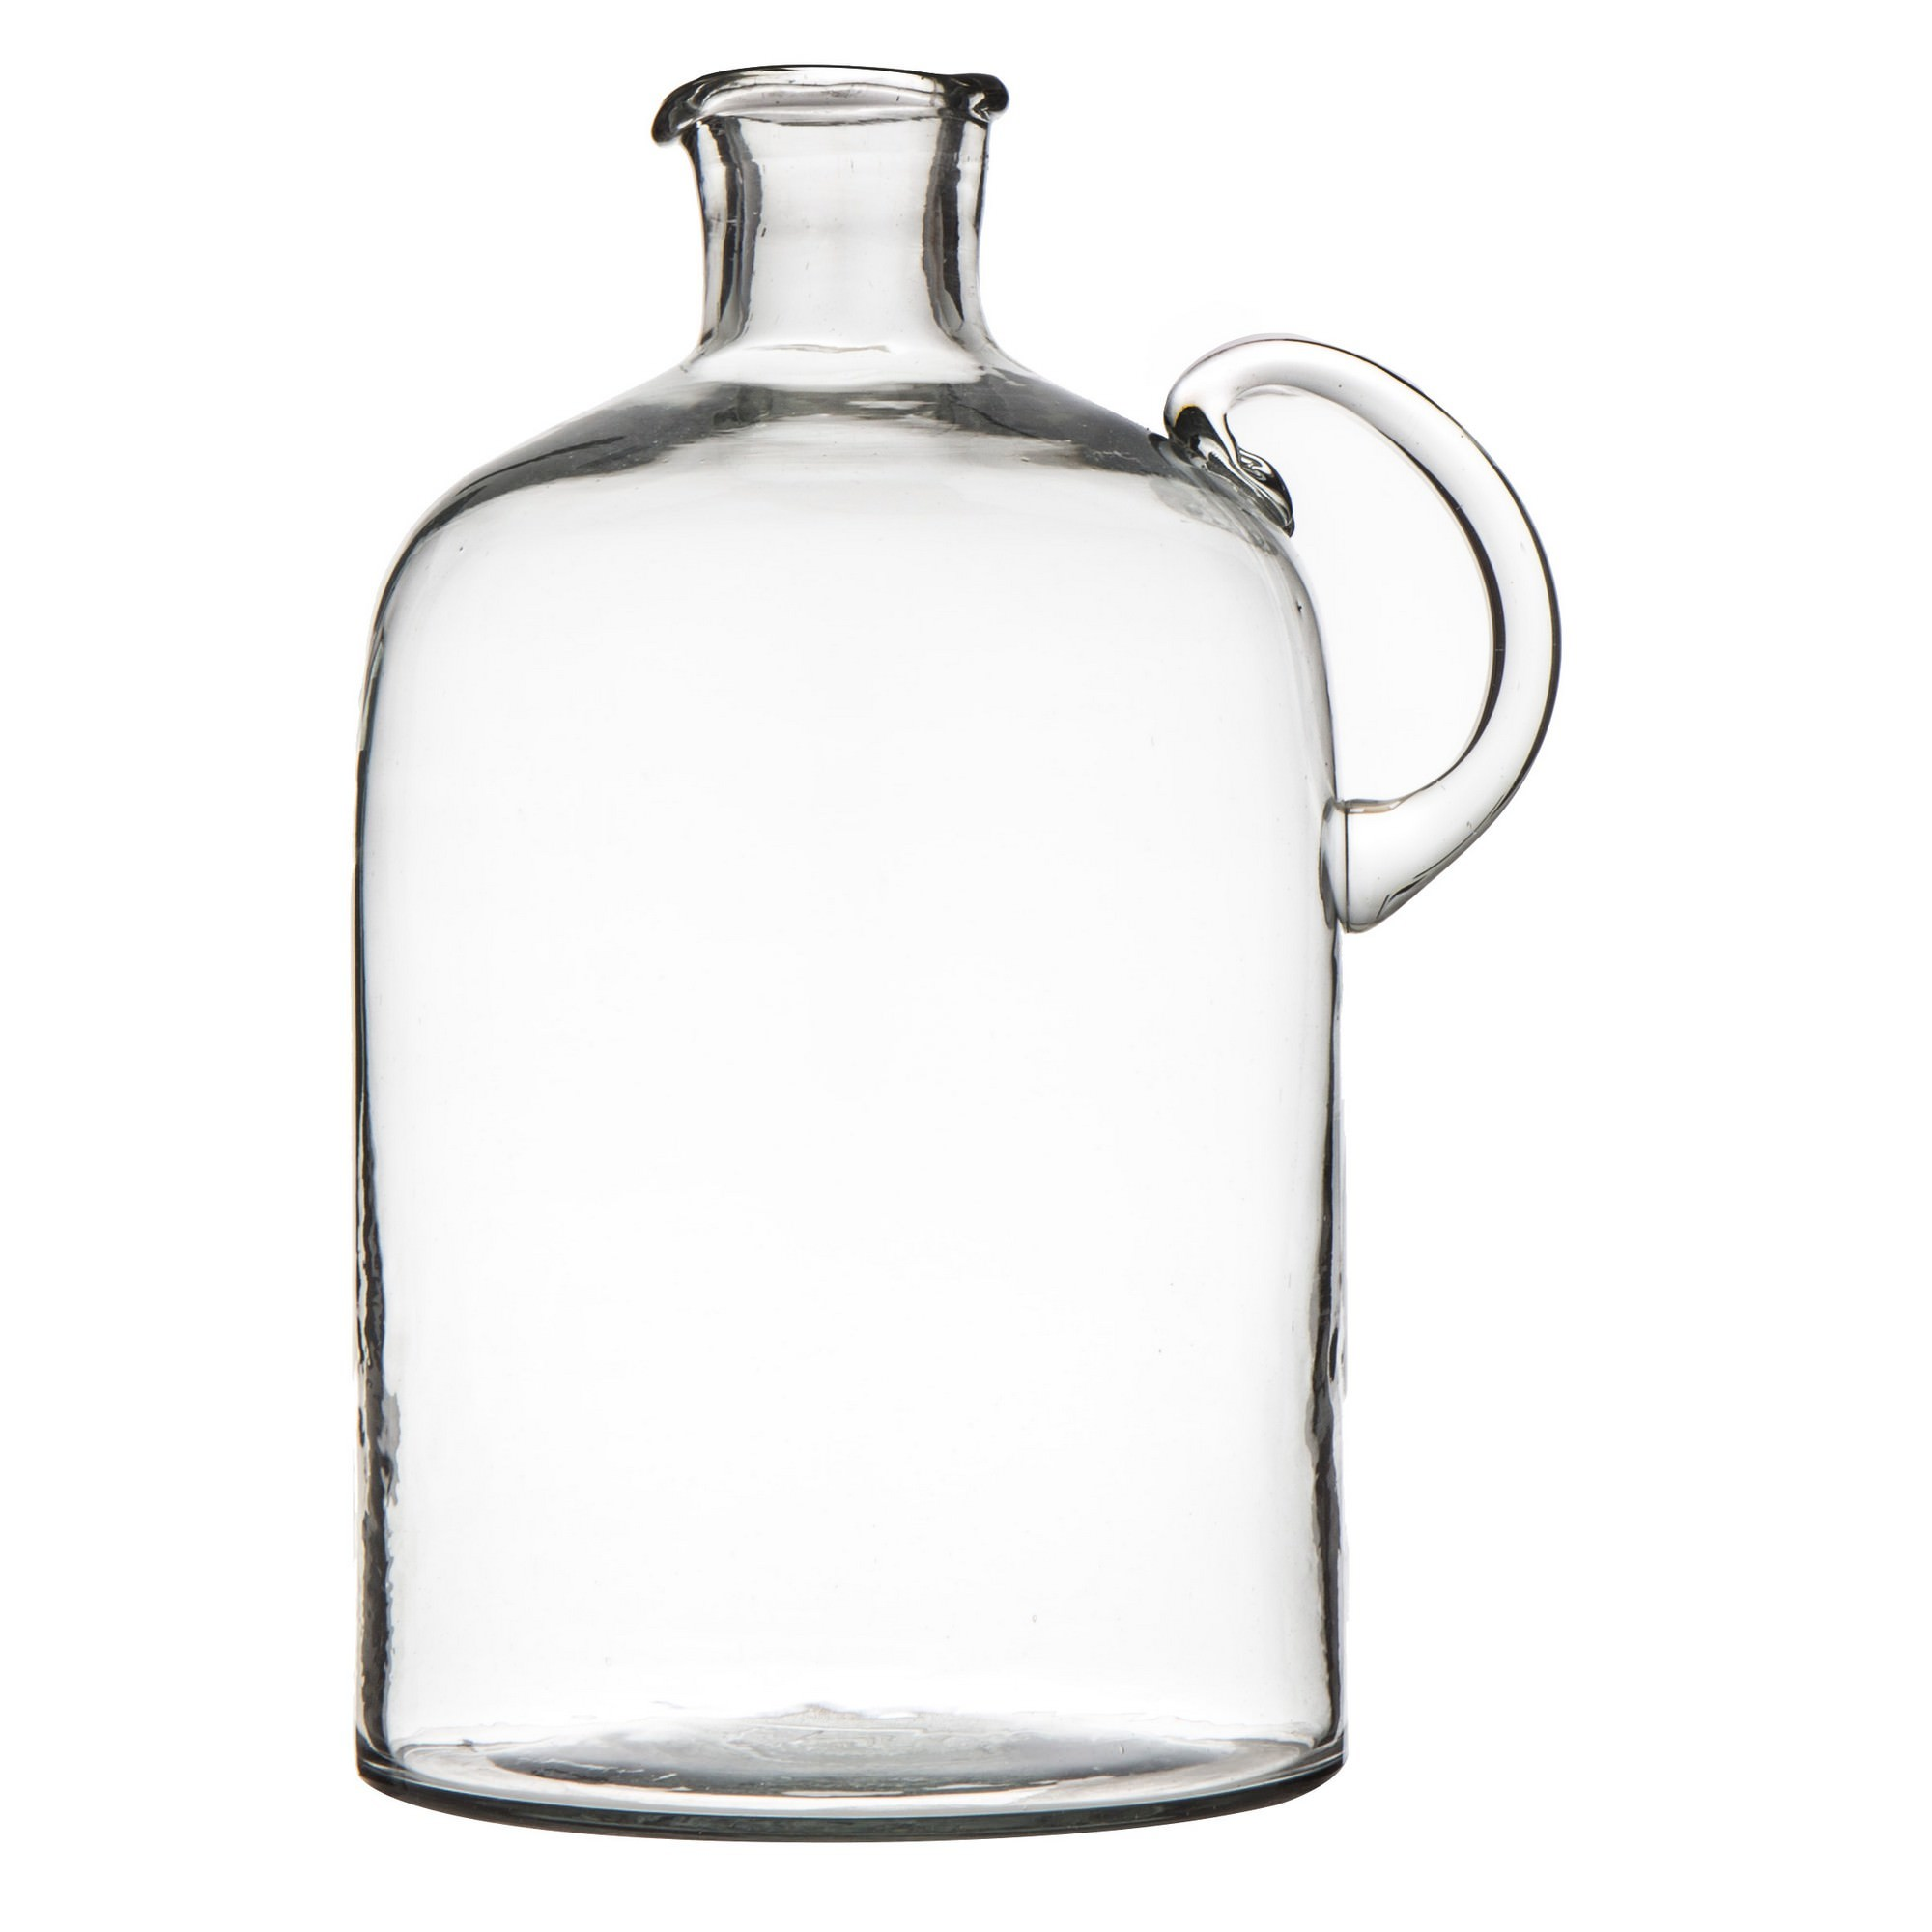 Hemmingway Glass Flagon, Large